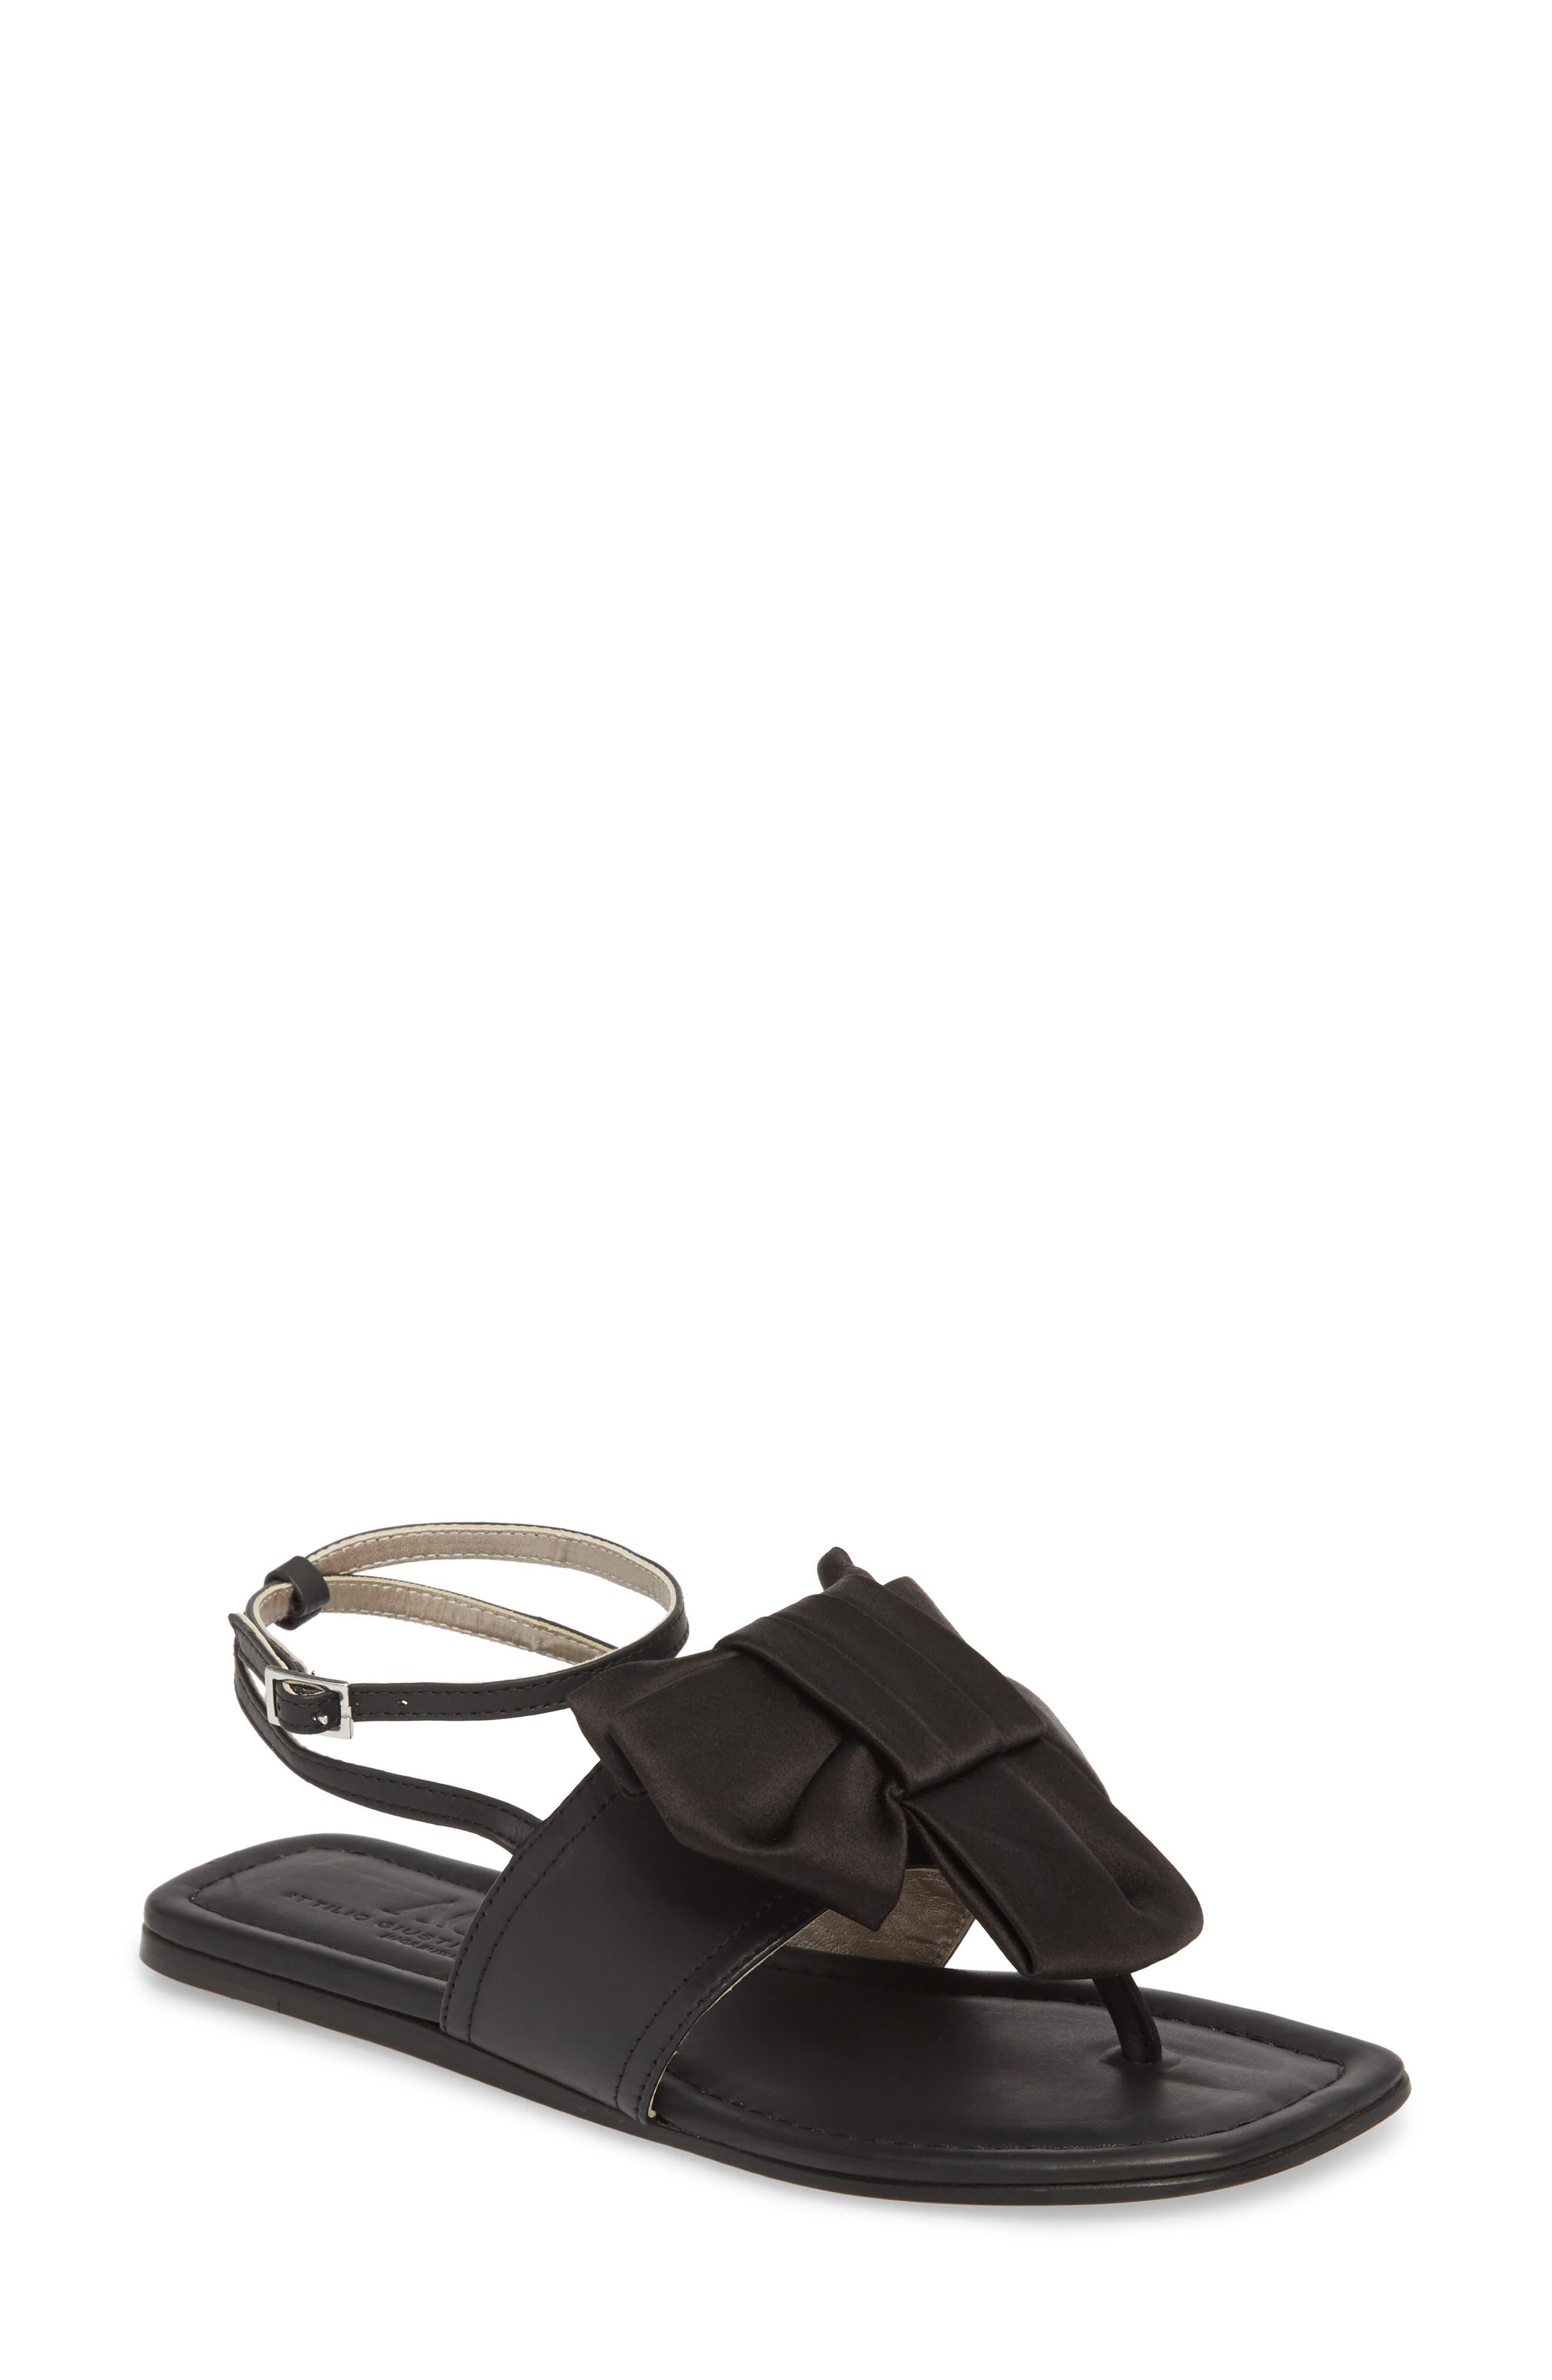 Ankle Strap Sandal,                         Main,                         color, Black Leather